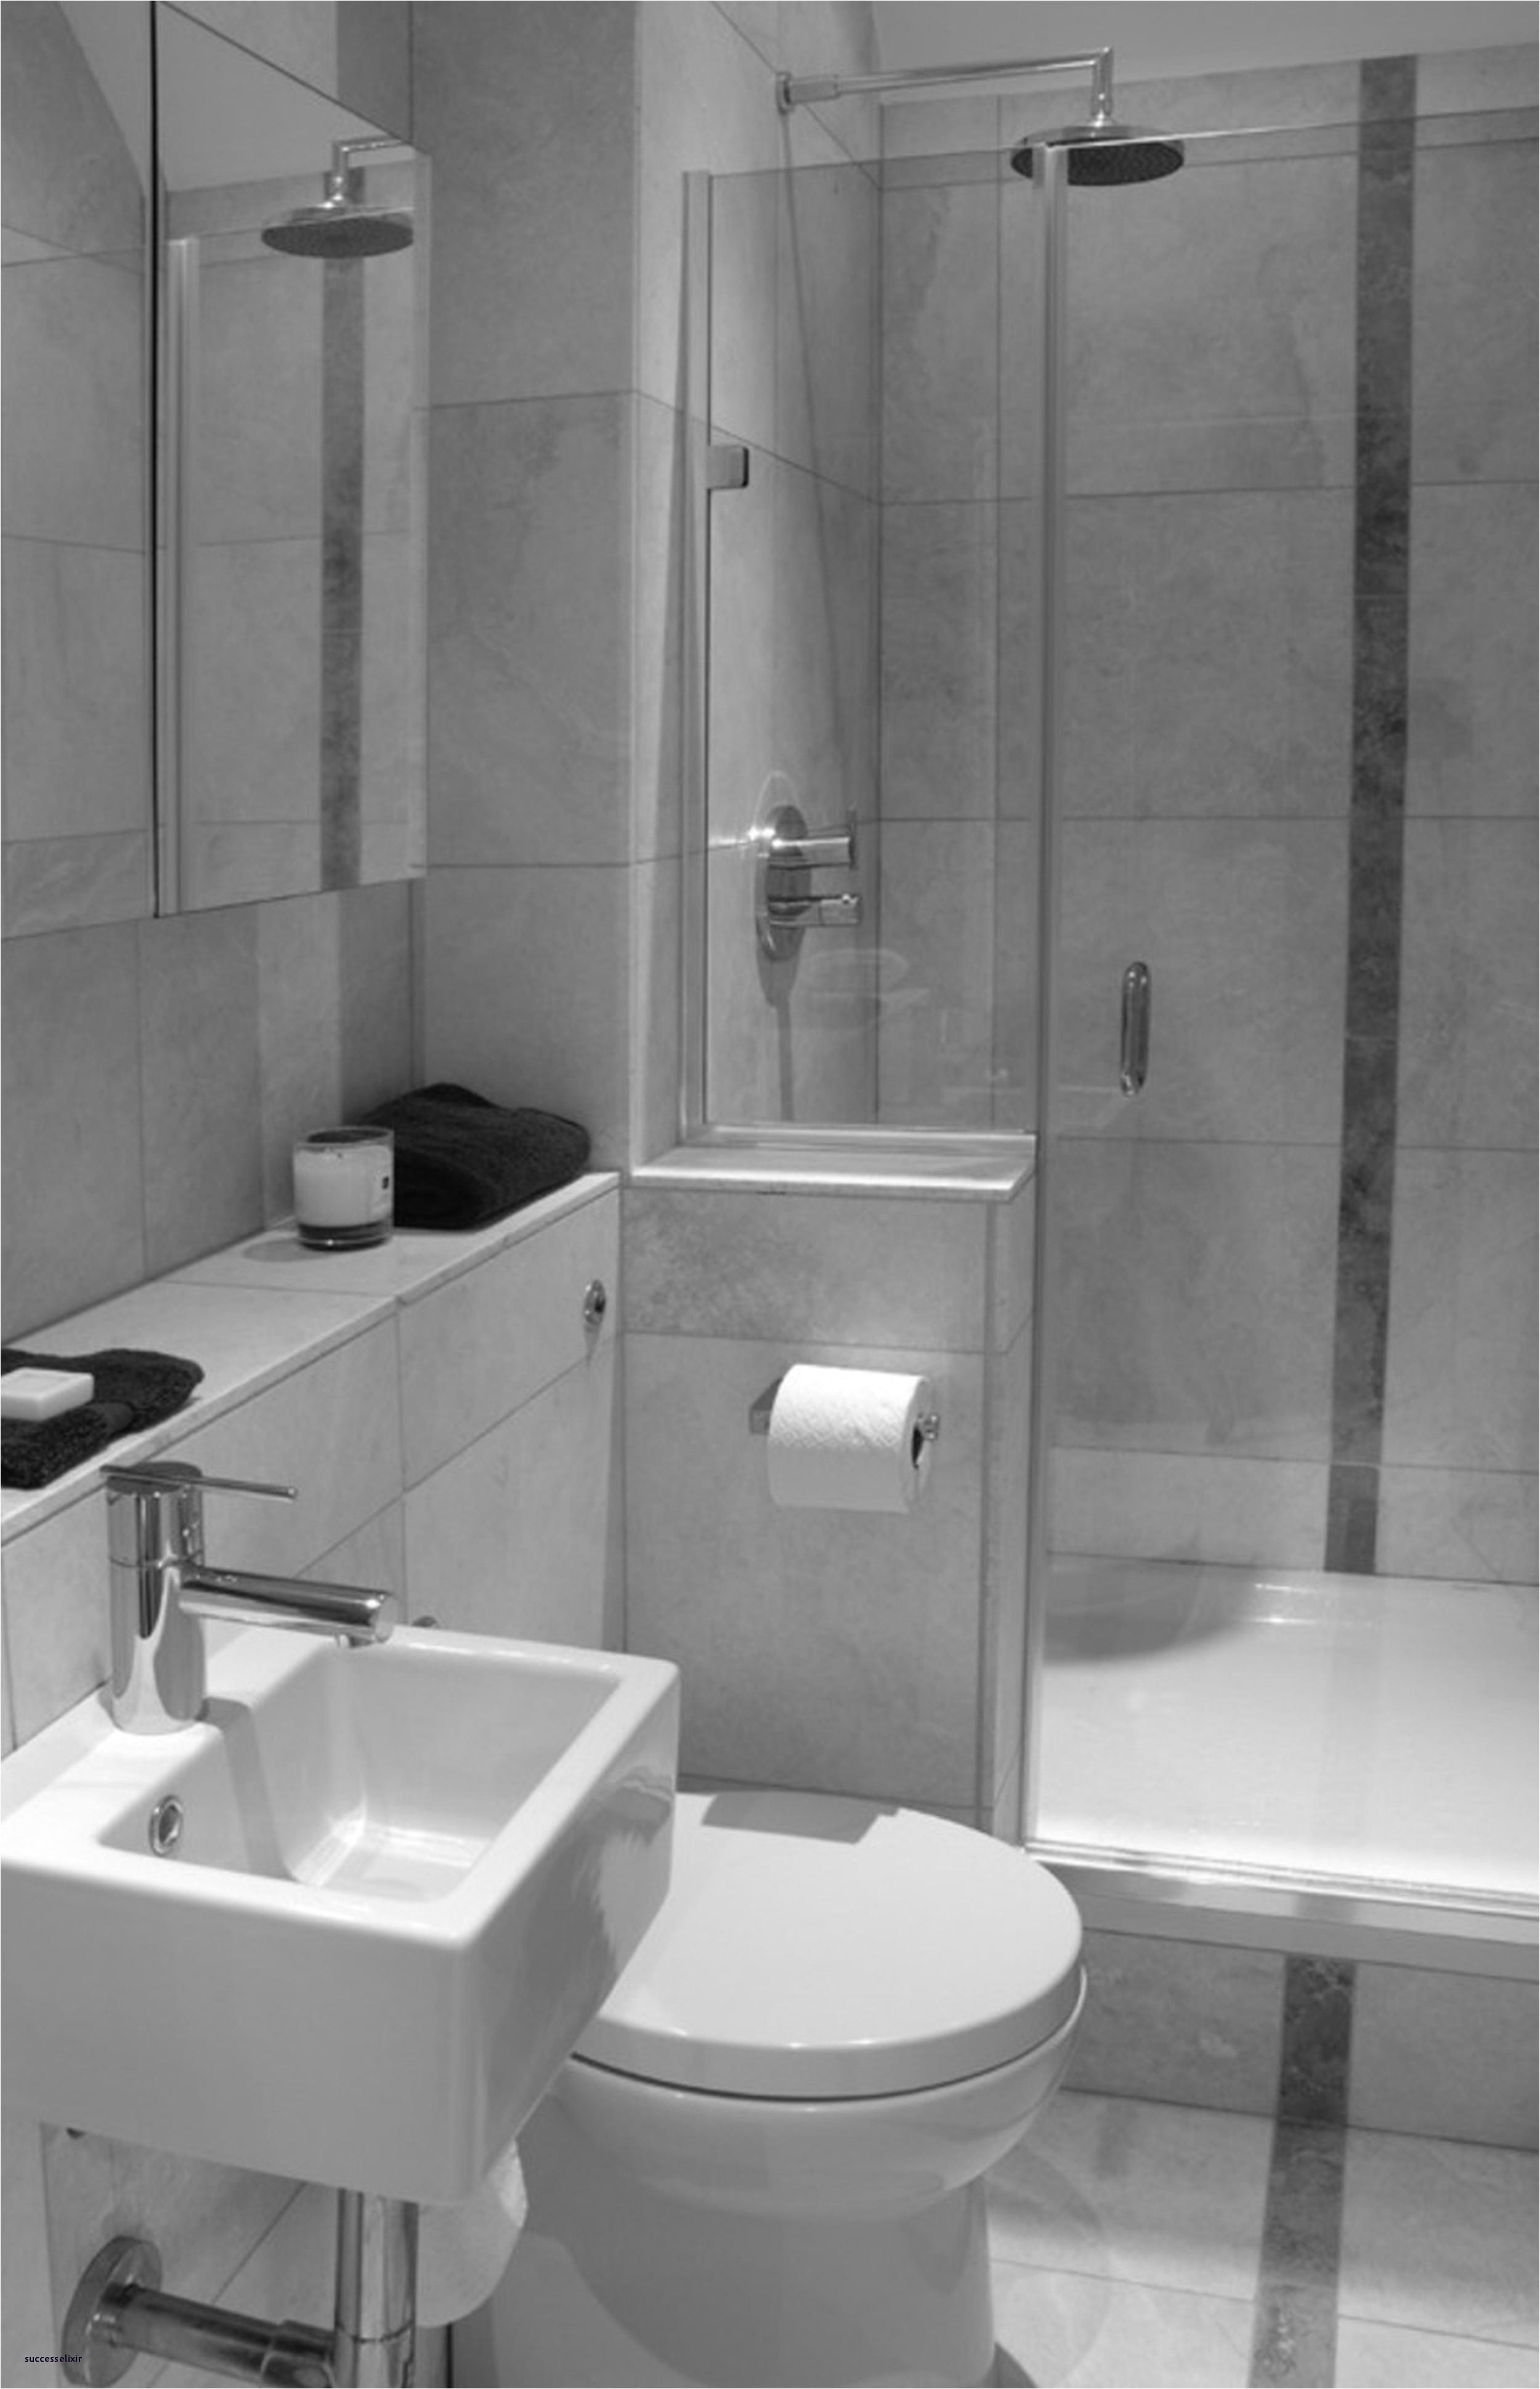 ikea bathroom sink cabinet reviews vanity plans fresh elegant ideas 0d reviewsl home design sinks